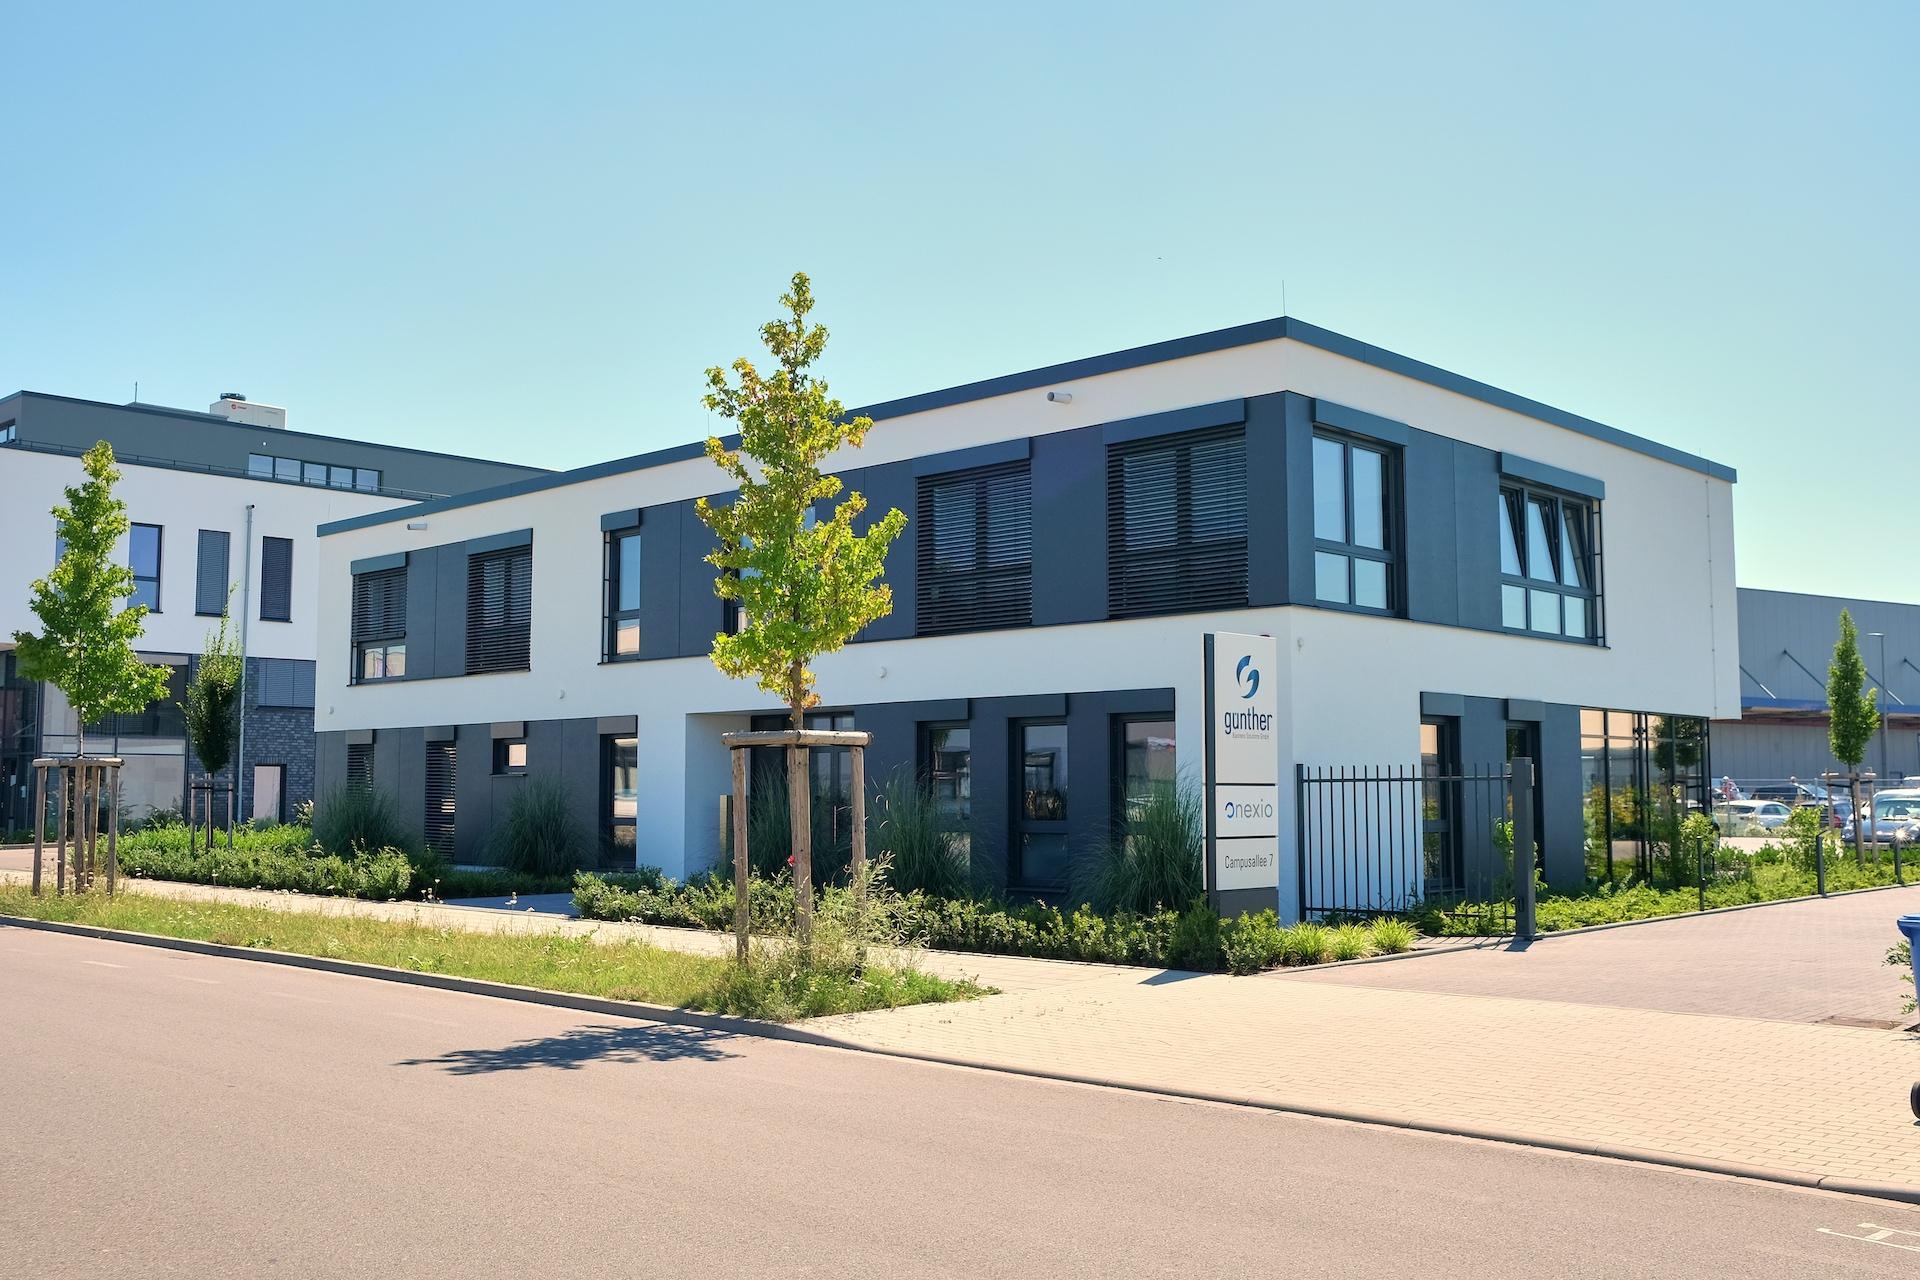 Firmengebäude | onexio GmbH / Günther Business Solutions GmbH